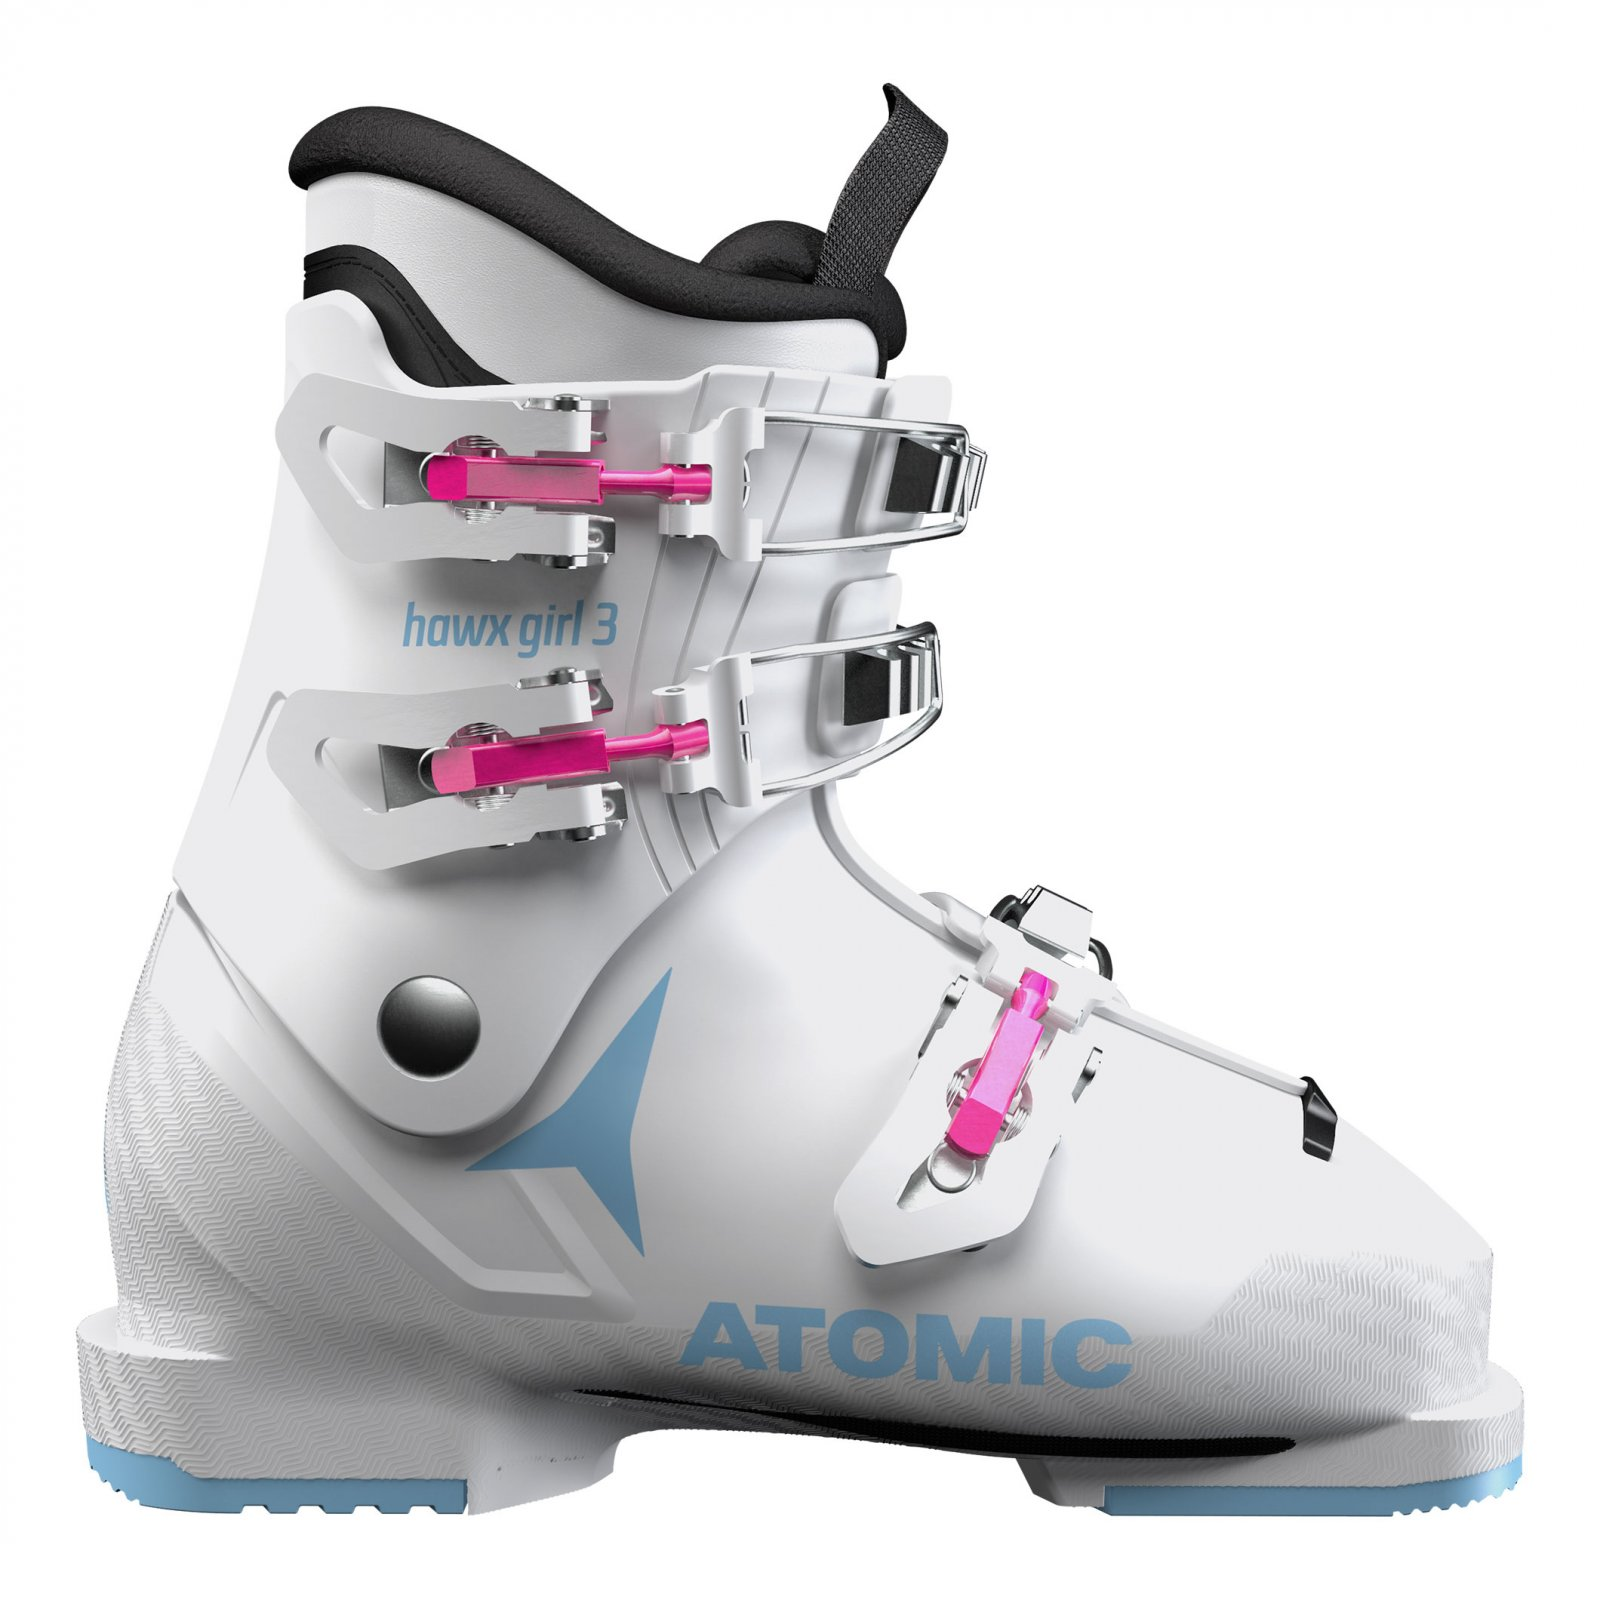 2020 Atomic Hawx Girl 3 Ski Boots